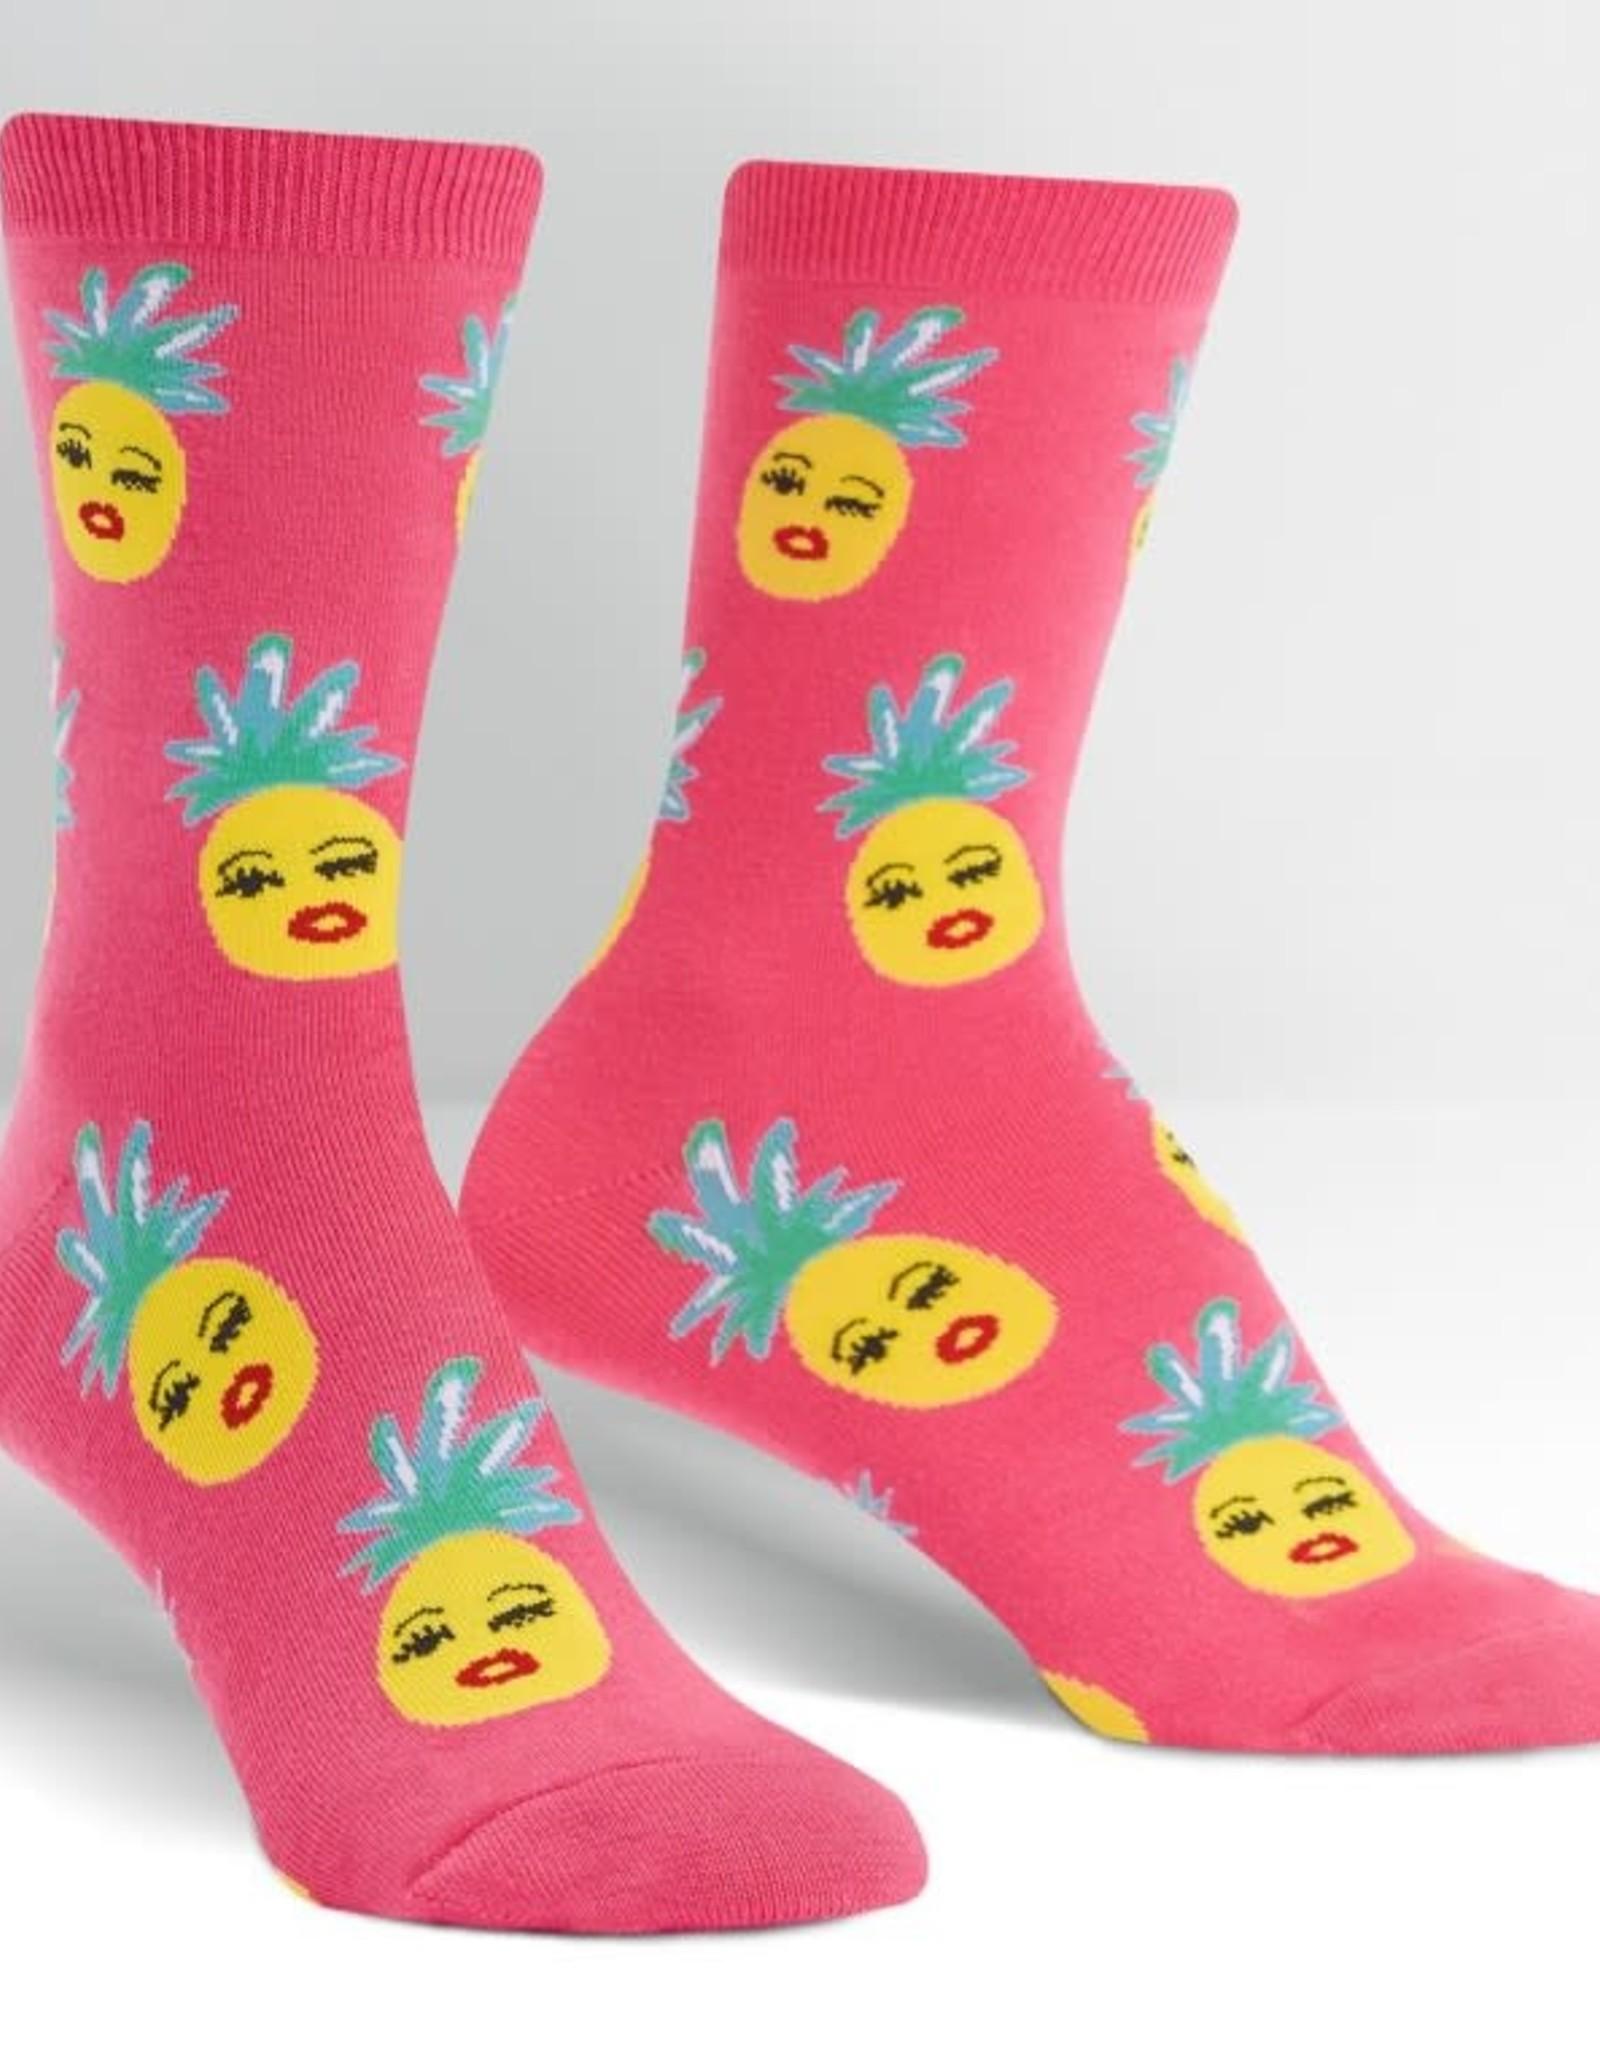 Sock It To Me Women's Crew: